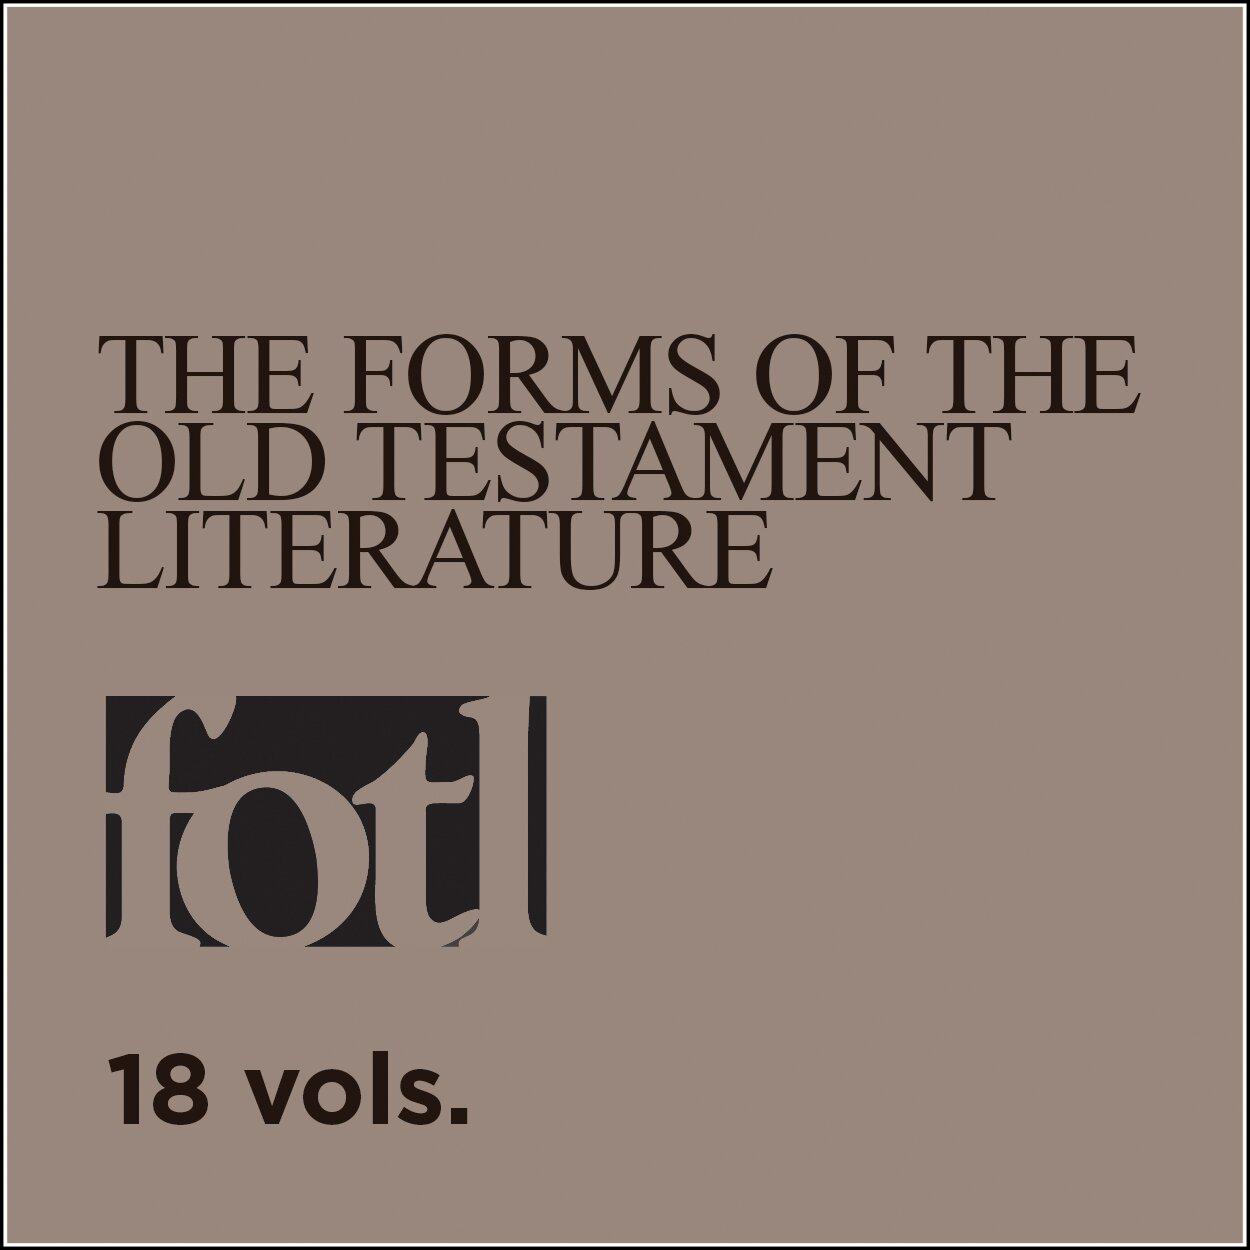 Forms of the Old Testament Literature Series | FOTL (18 vols.)